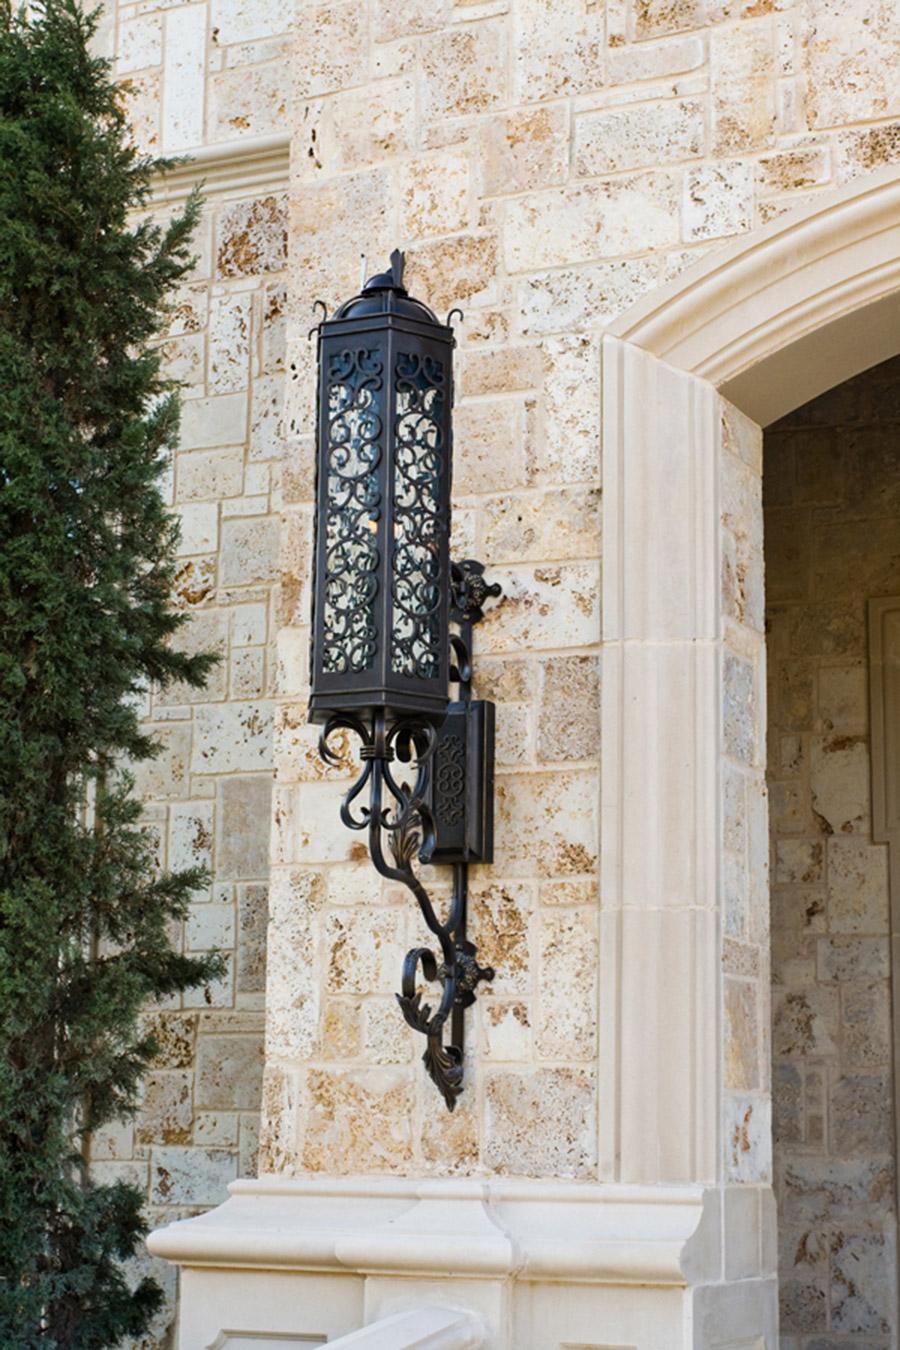 Victory-iron-lighting-fixture-foyer-hall-pendant-entry-kitchen-solara-ligthing-E007-013-EG-(4)